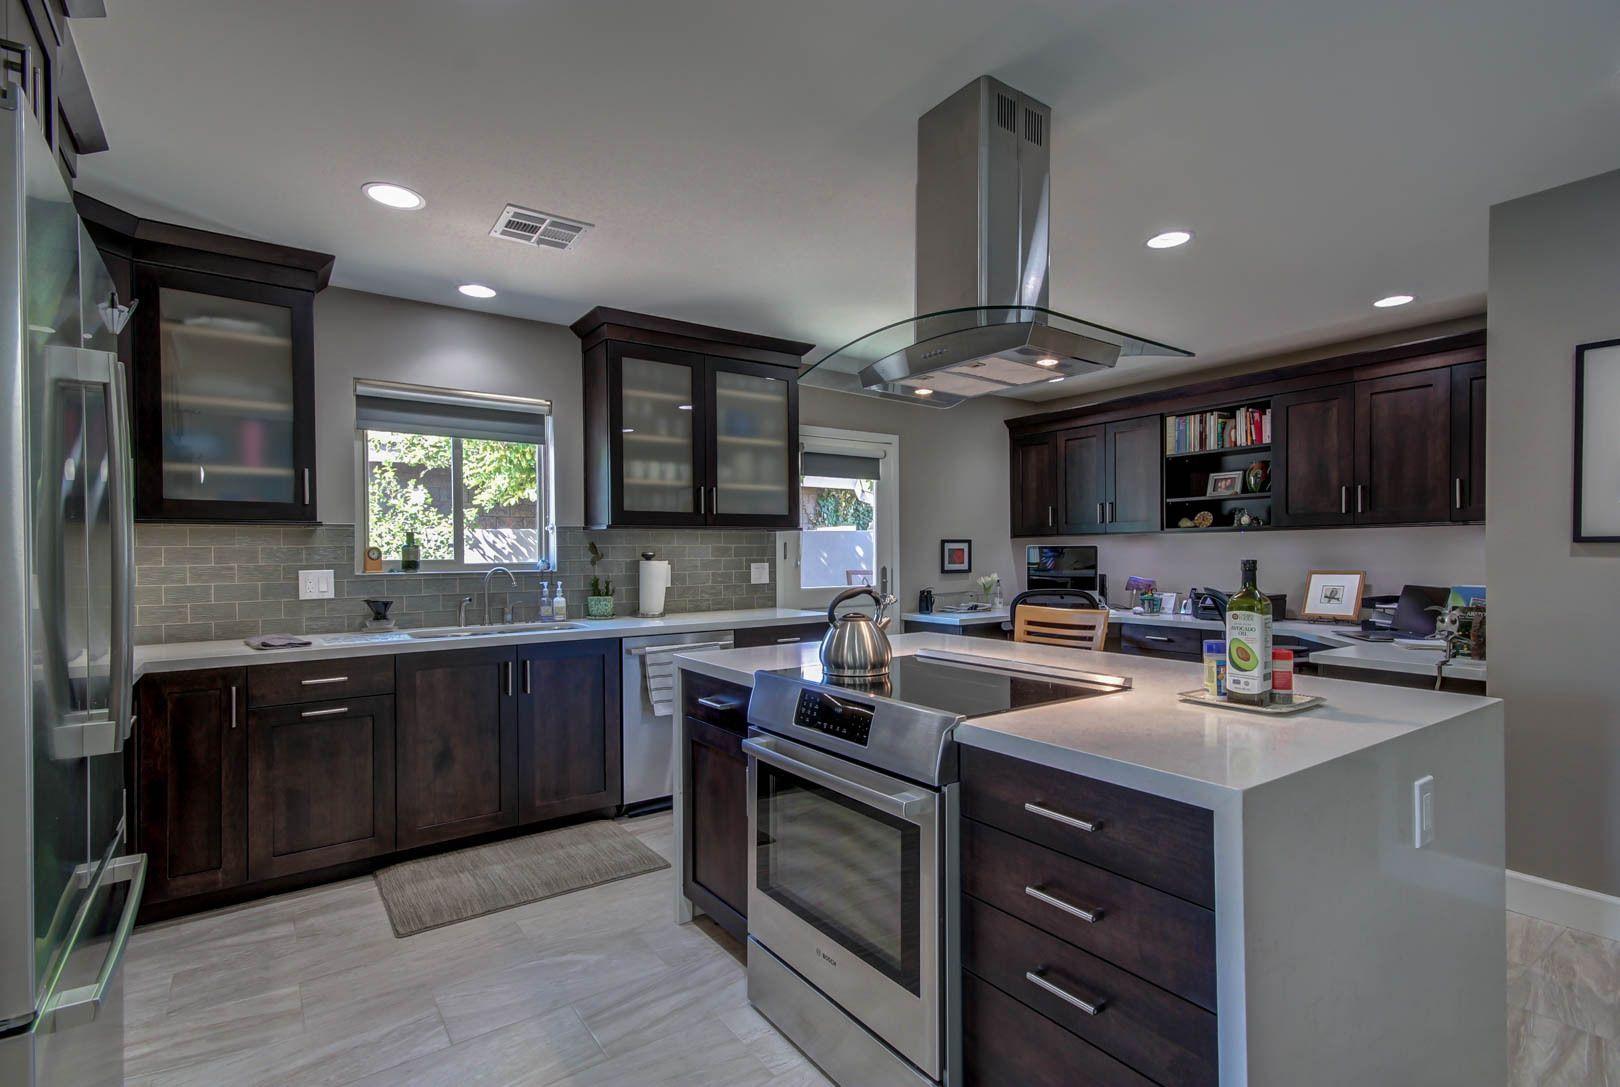 Scottsdale, AZ Contemporary Kitchen Remodel   Good Guys Remodeling LLC Design